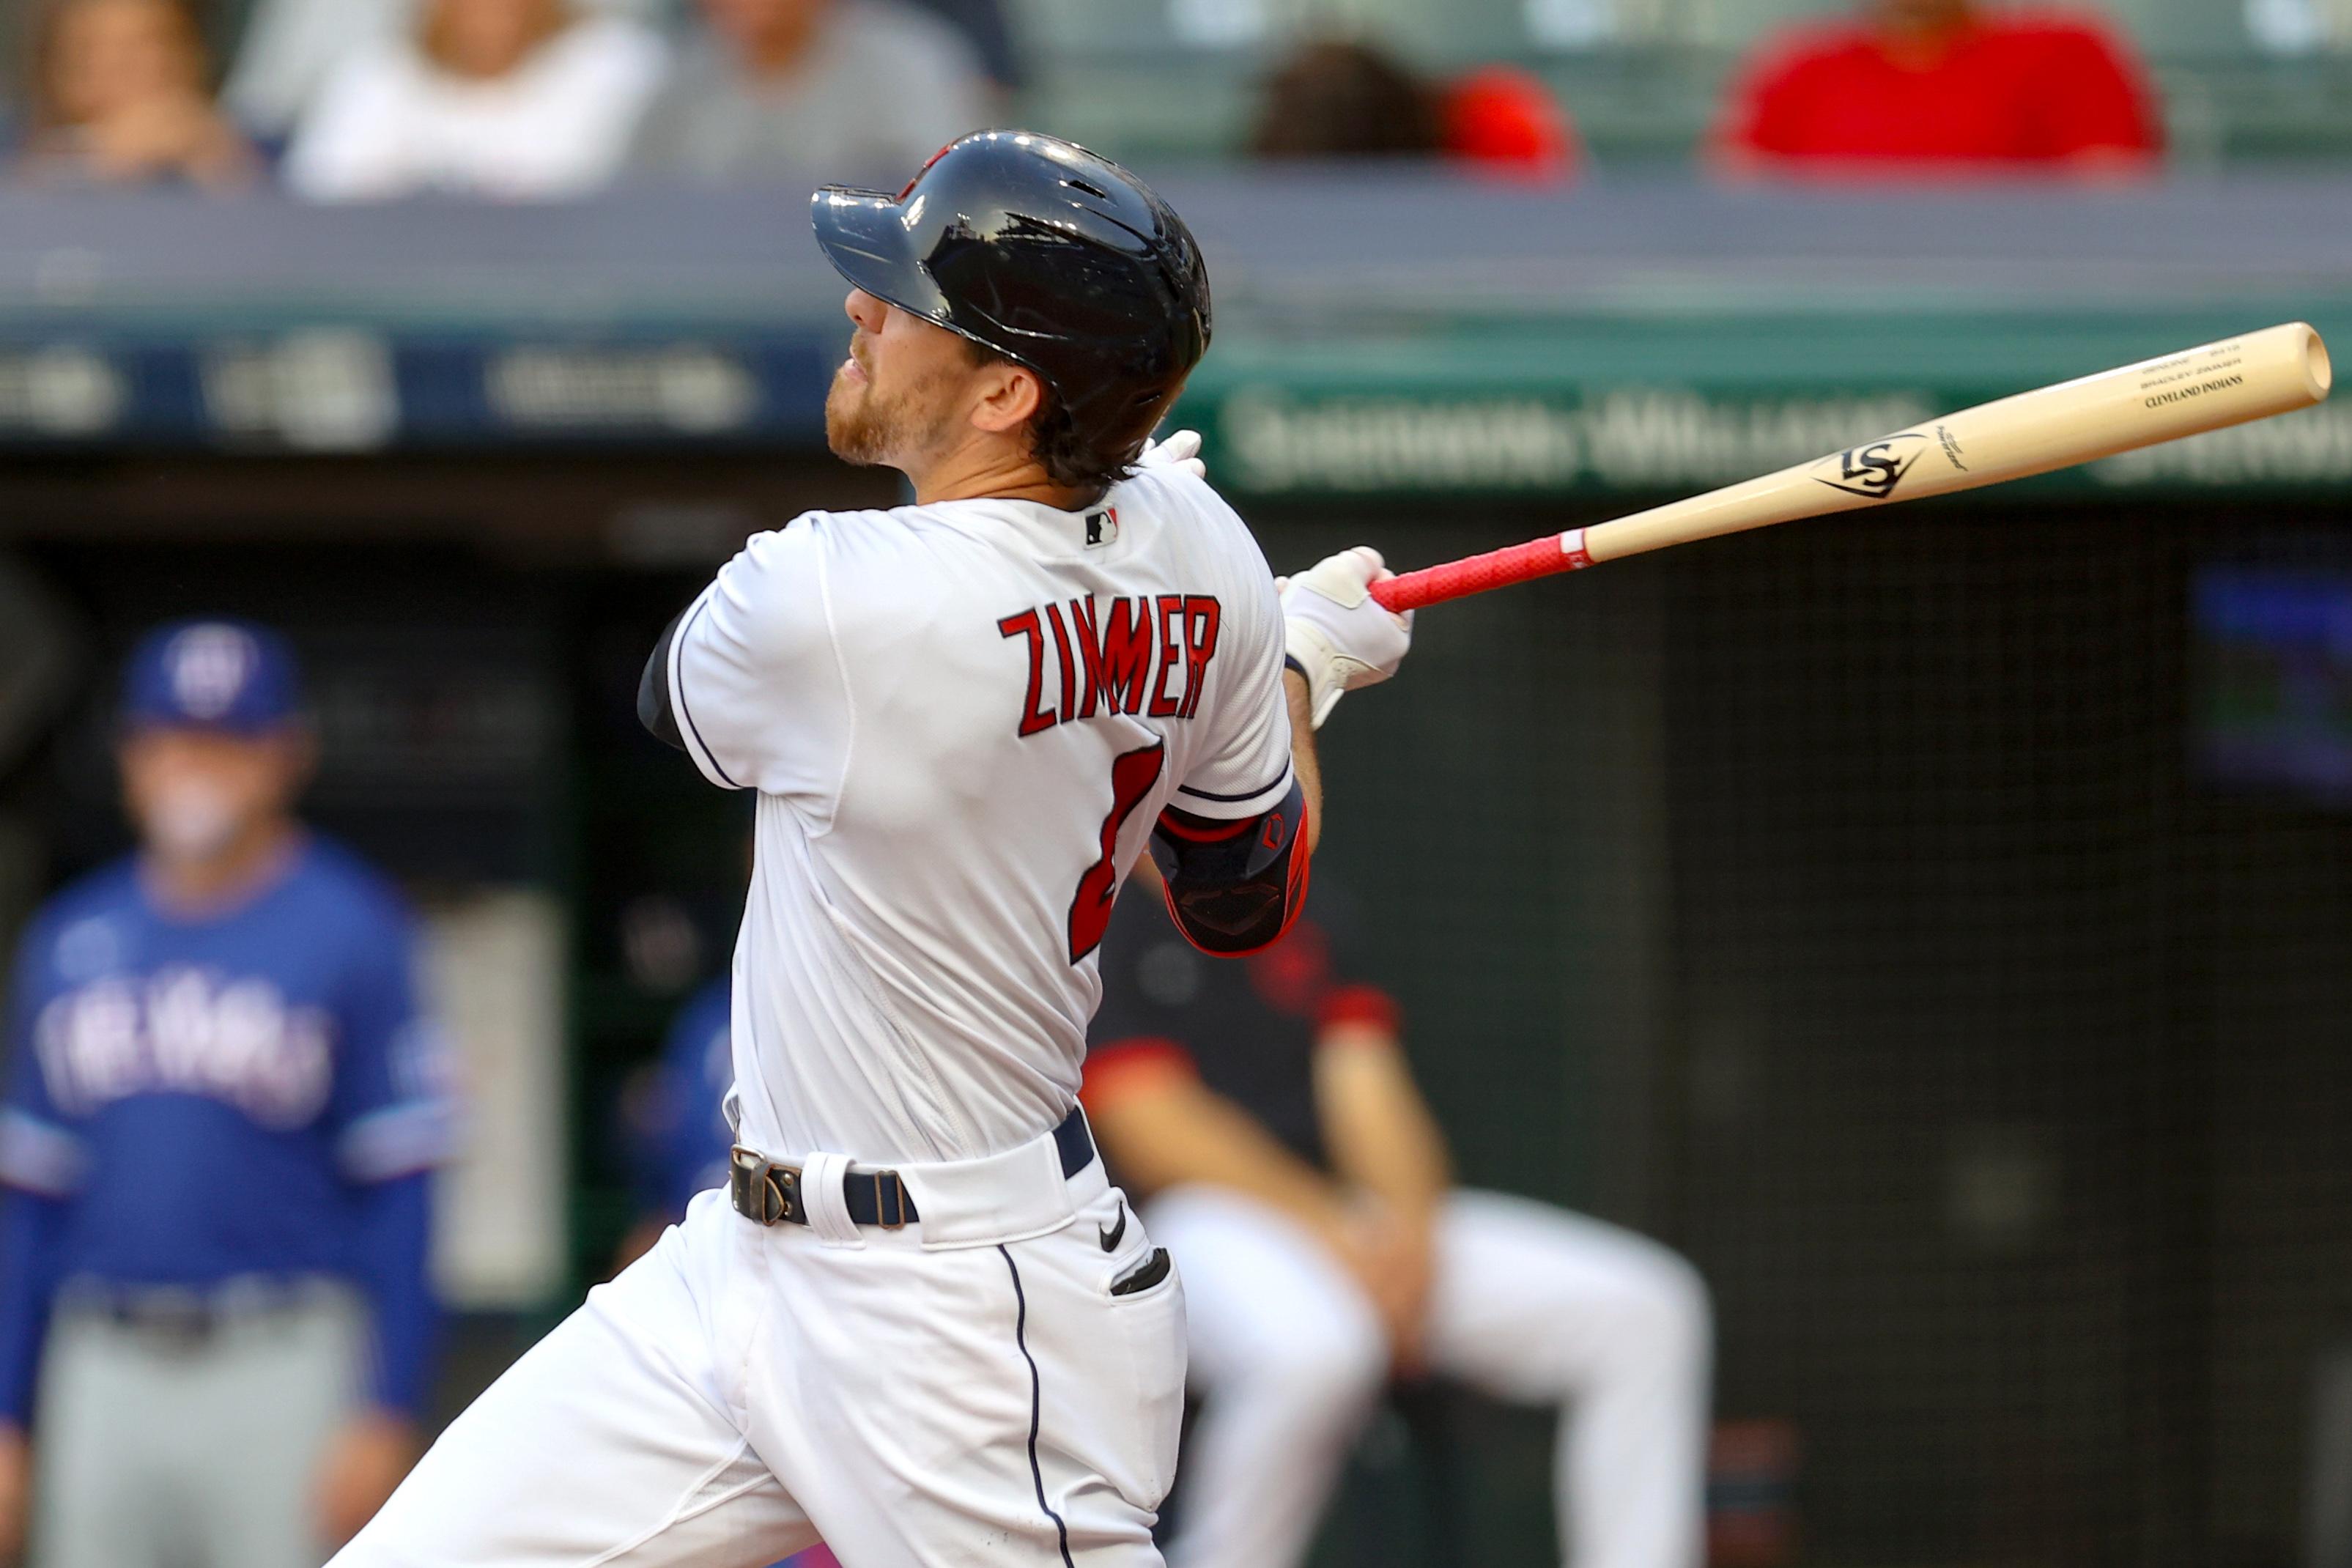 MLB: AUG 26 Rangers at Indians